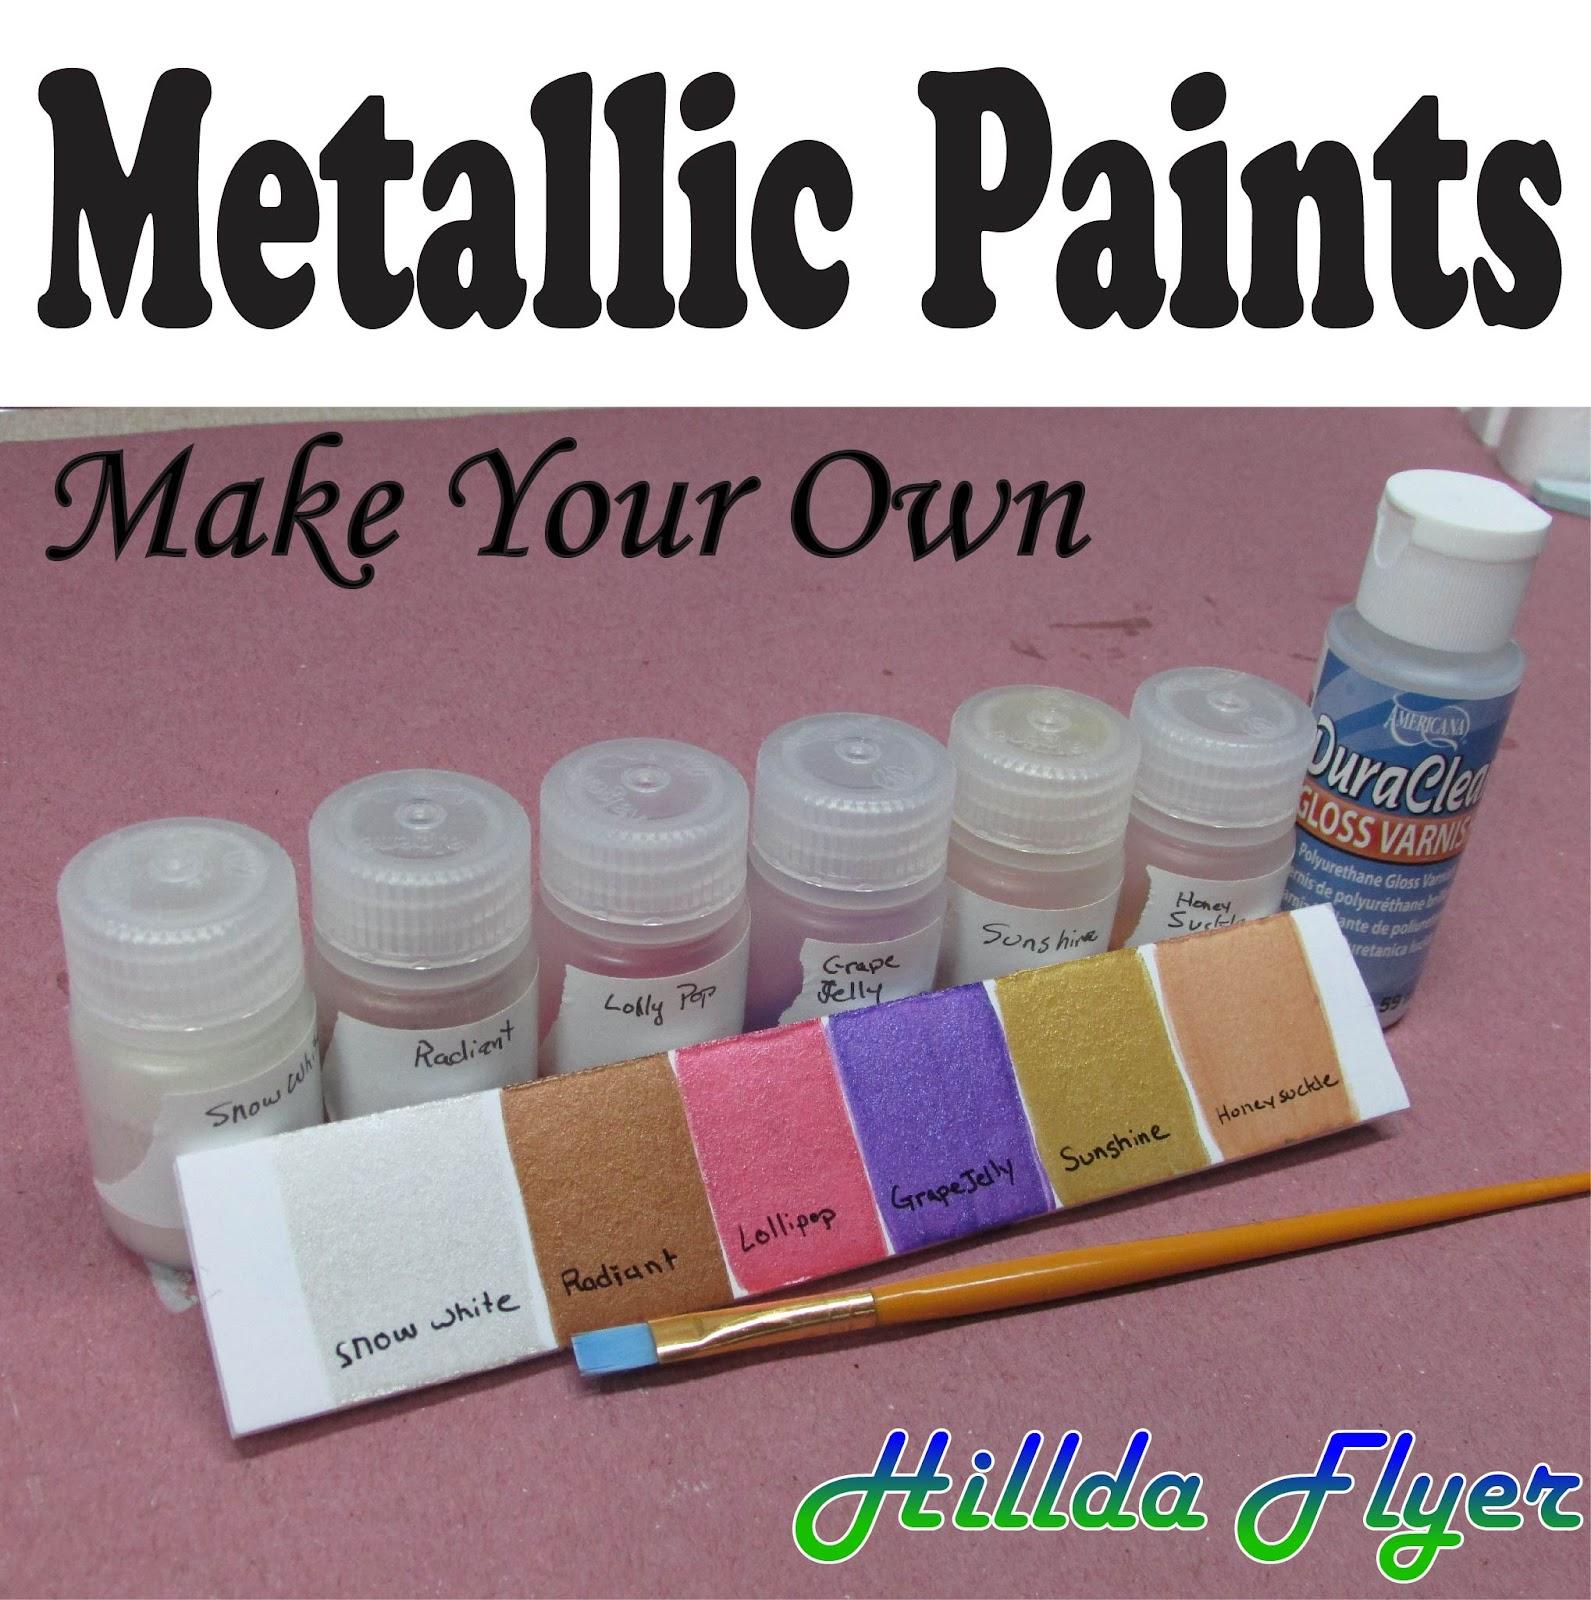 Metallic Paint - Make Your Own | Flite Test